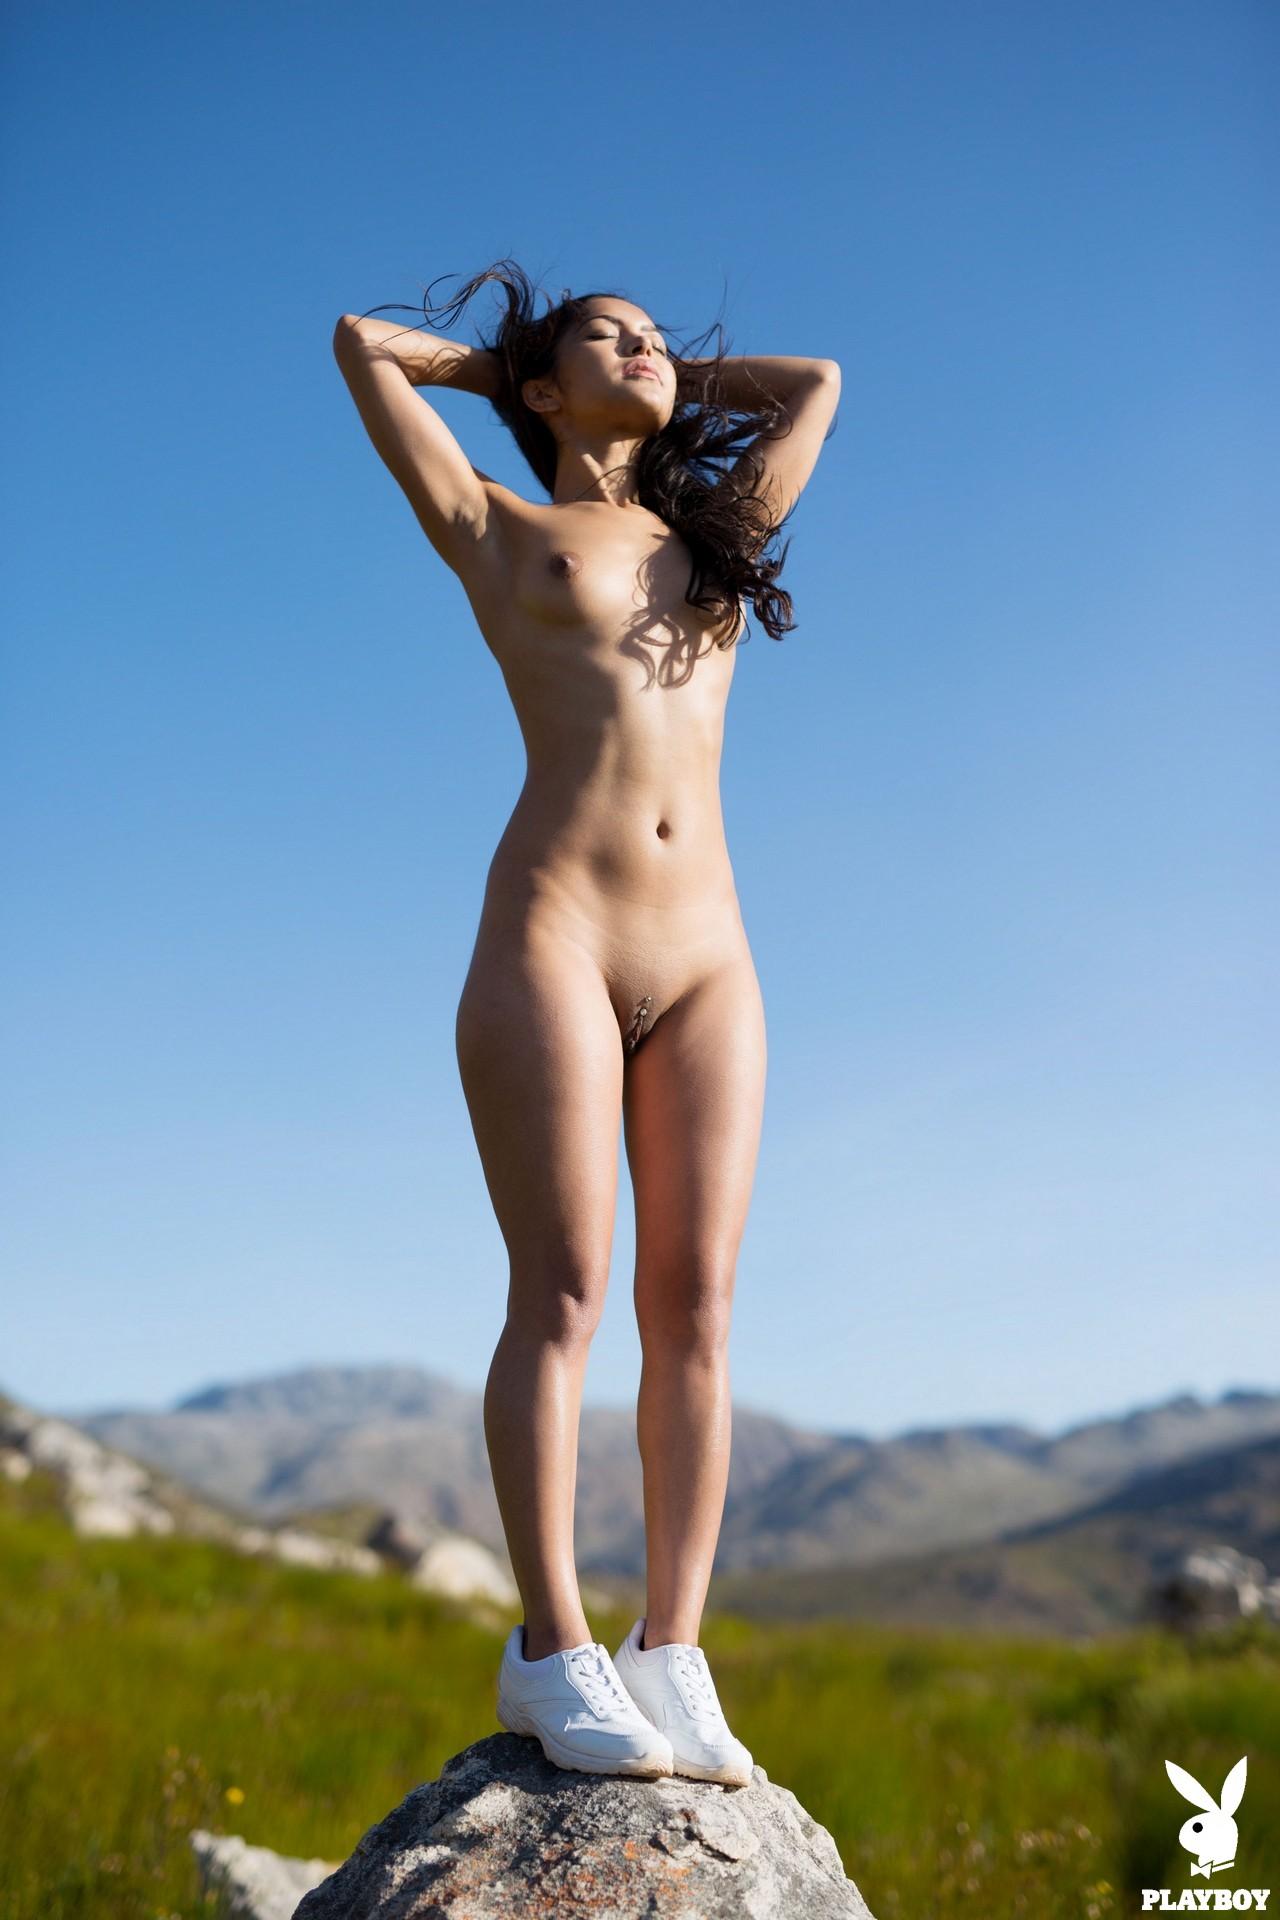 Chloe Rose in Trail Blazing 29